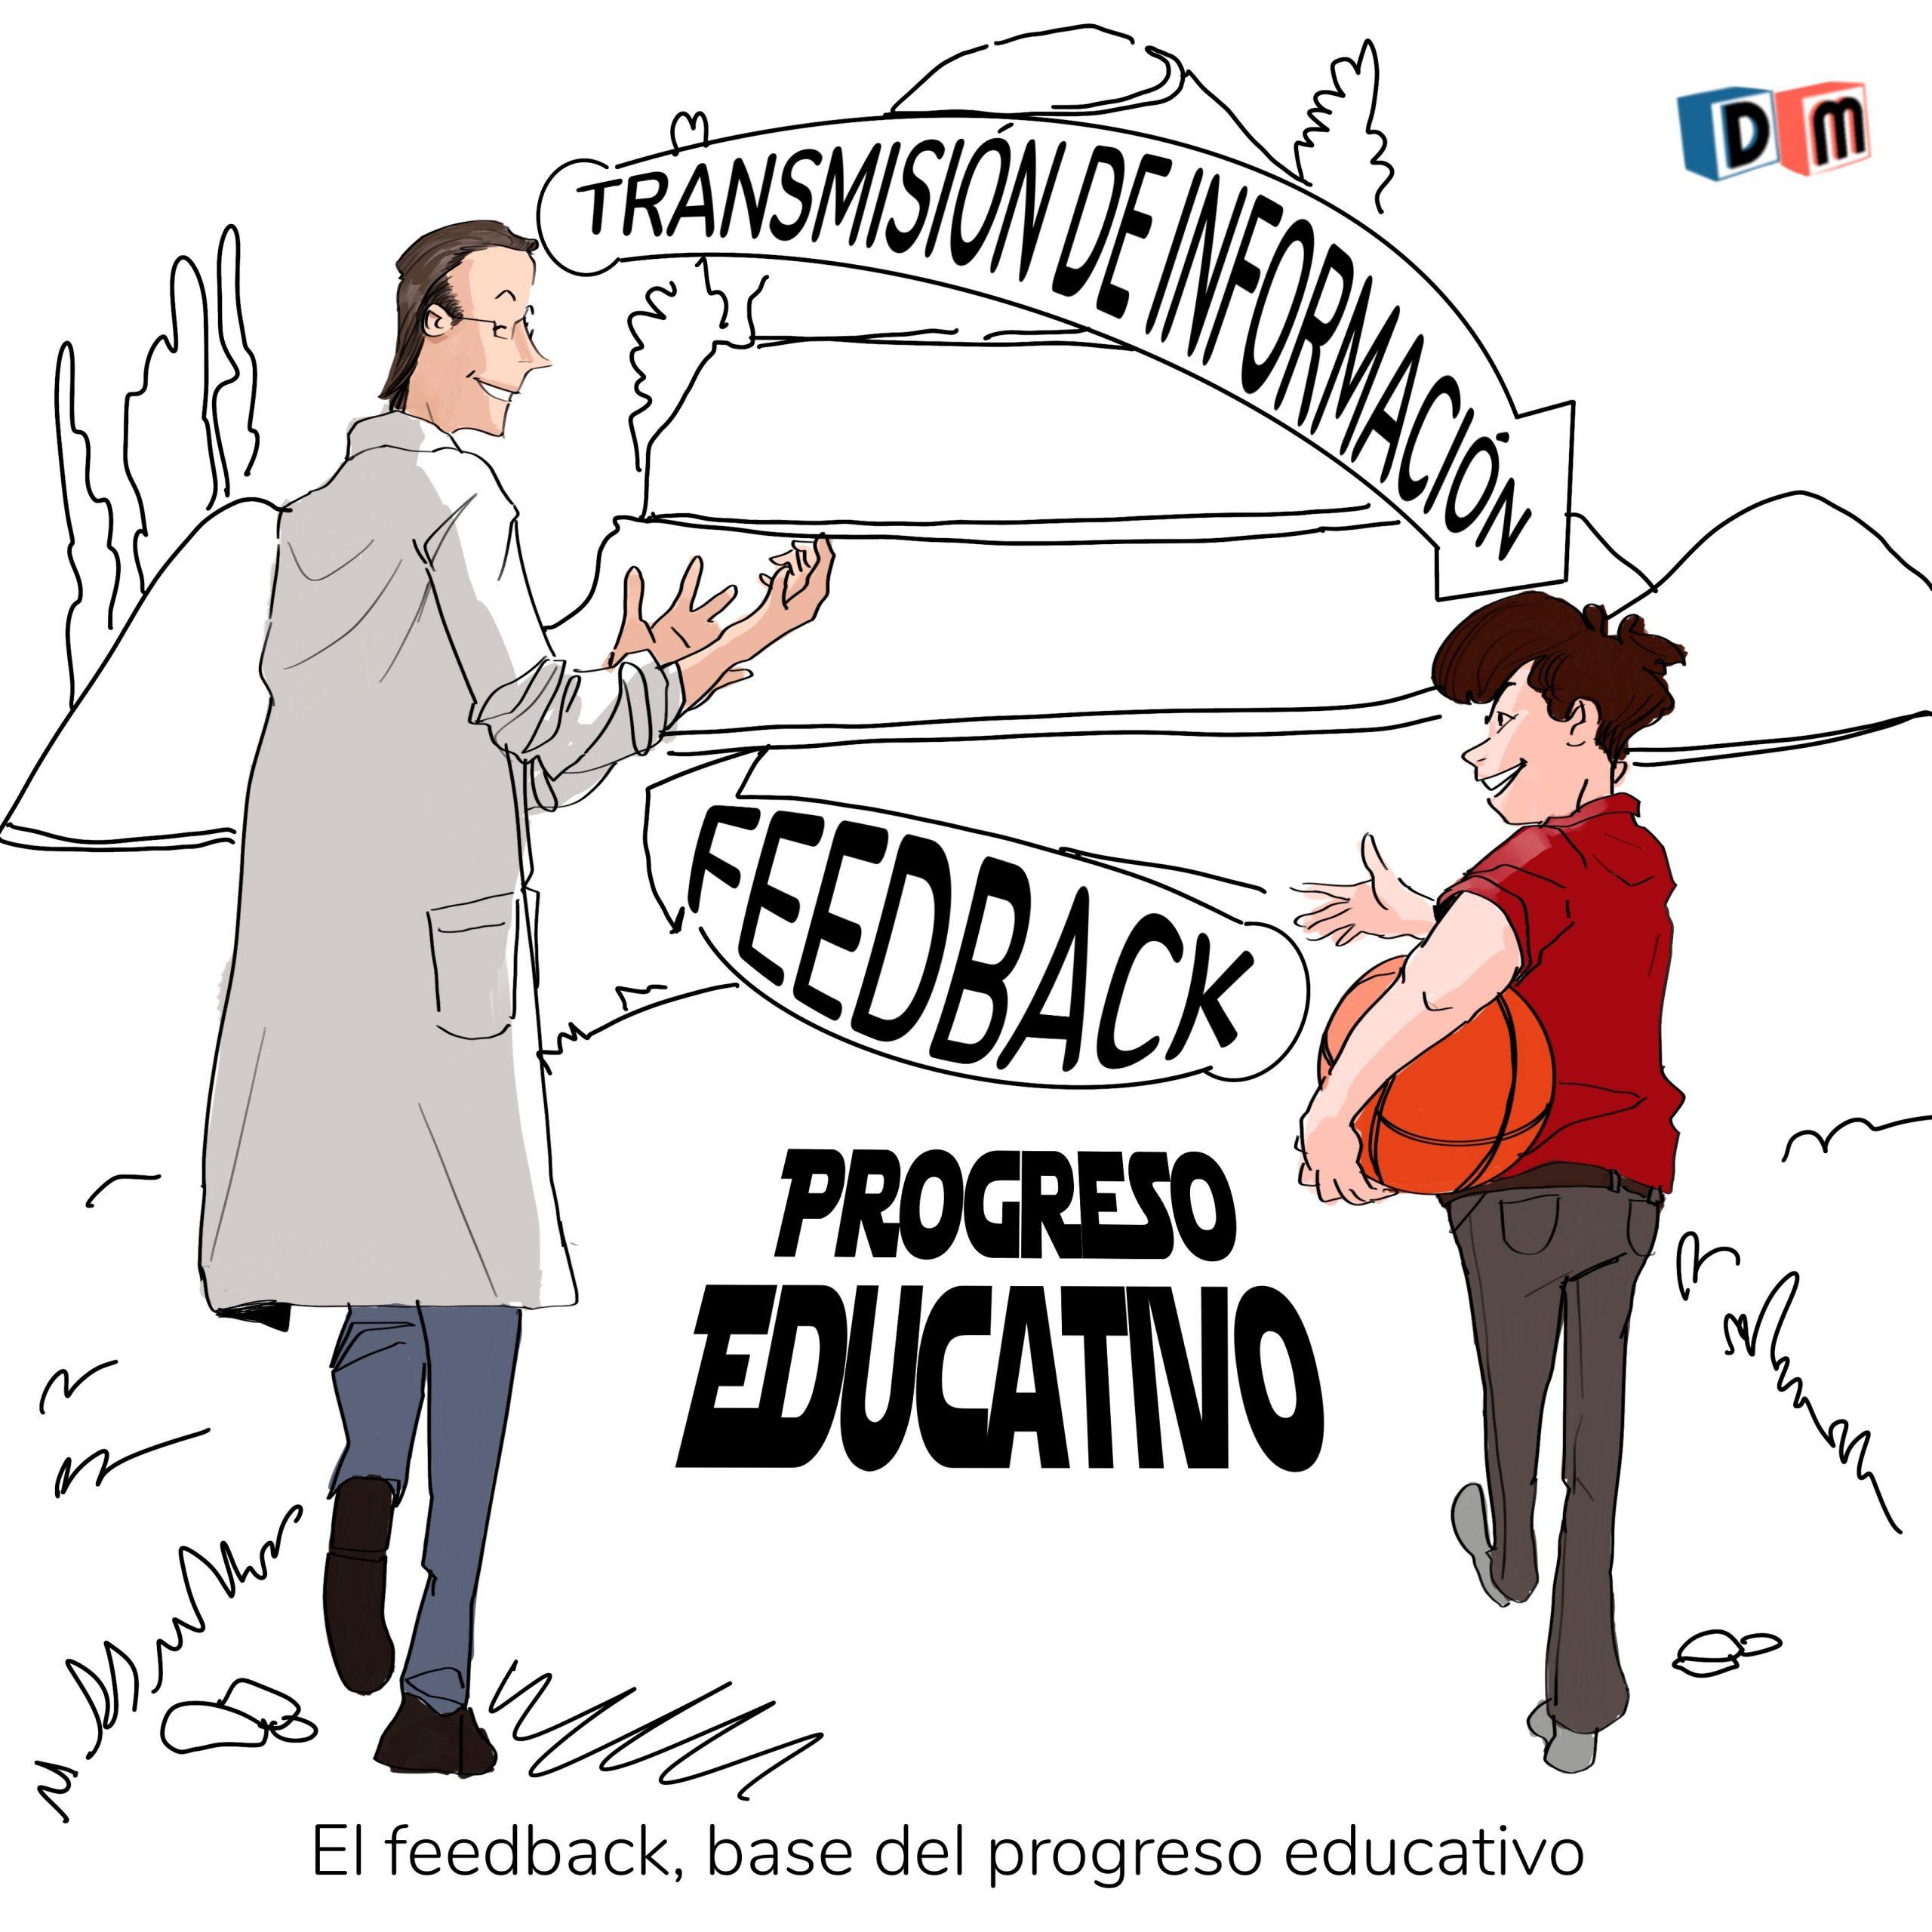 David Mora_Viñeta 36_El feedback, base del progreso educativo